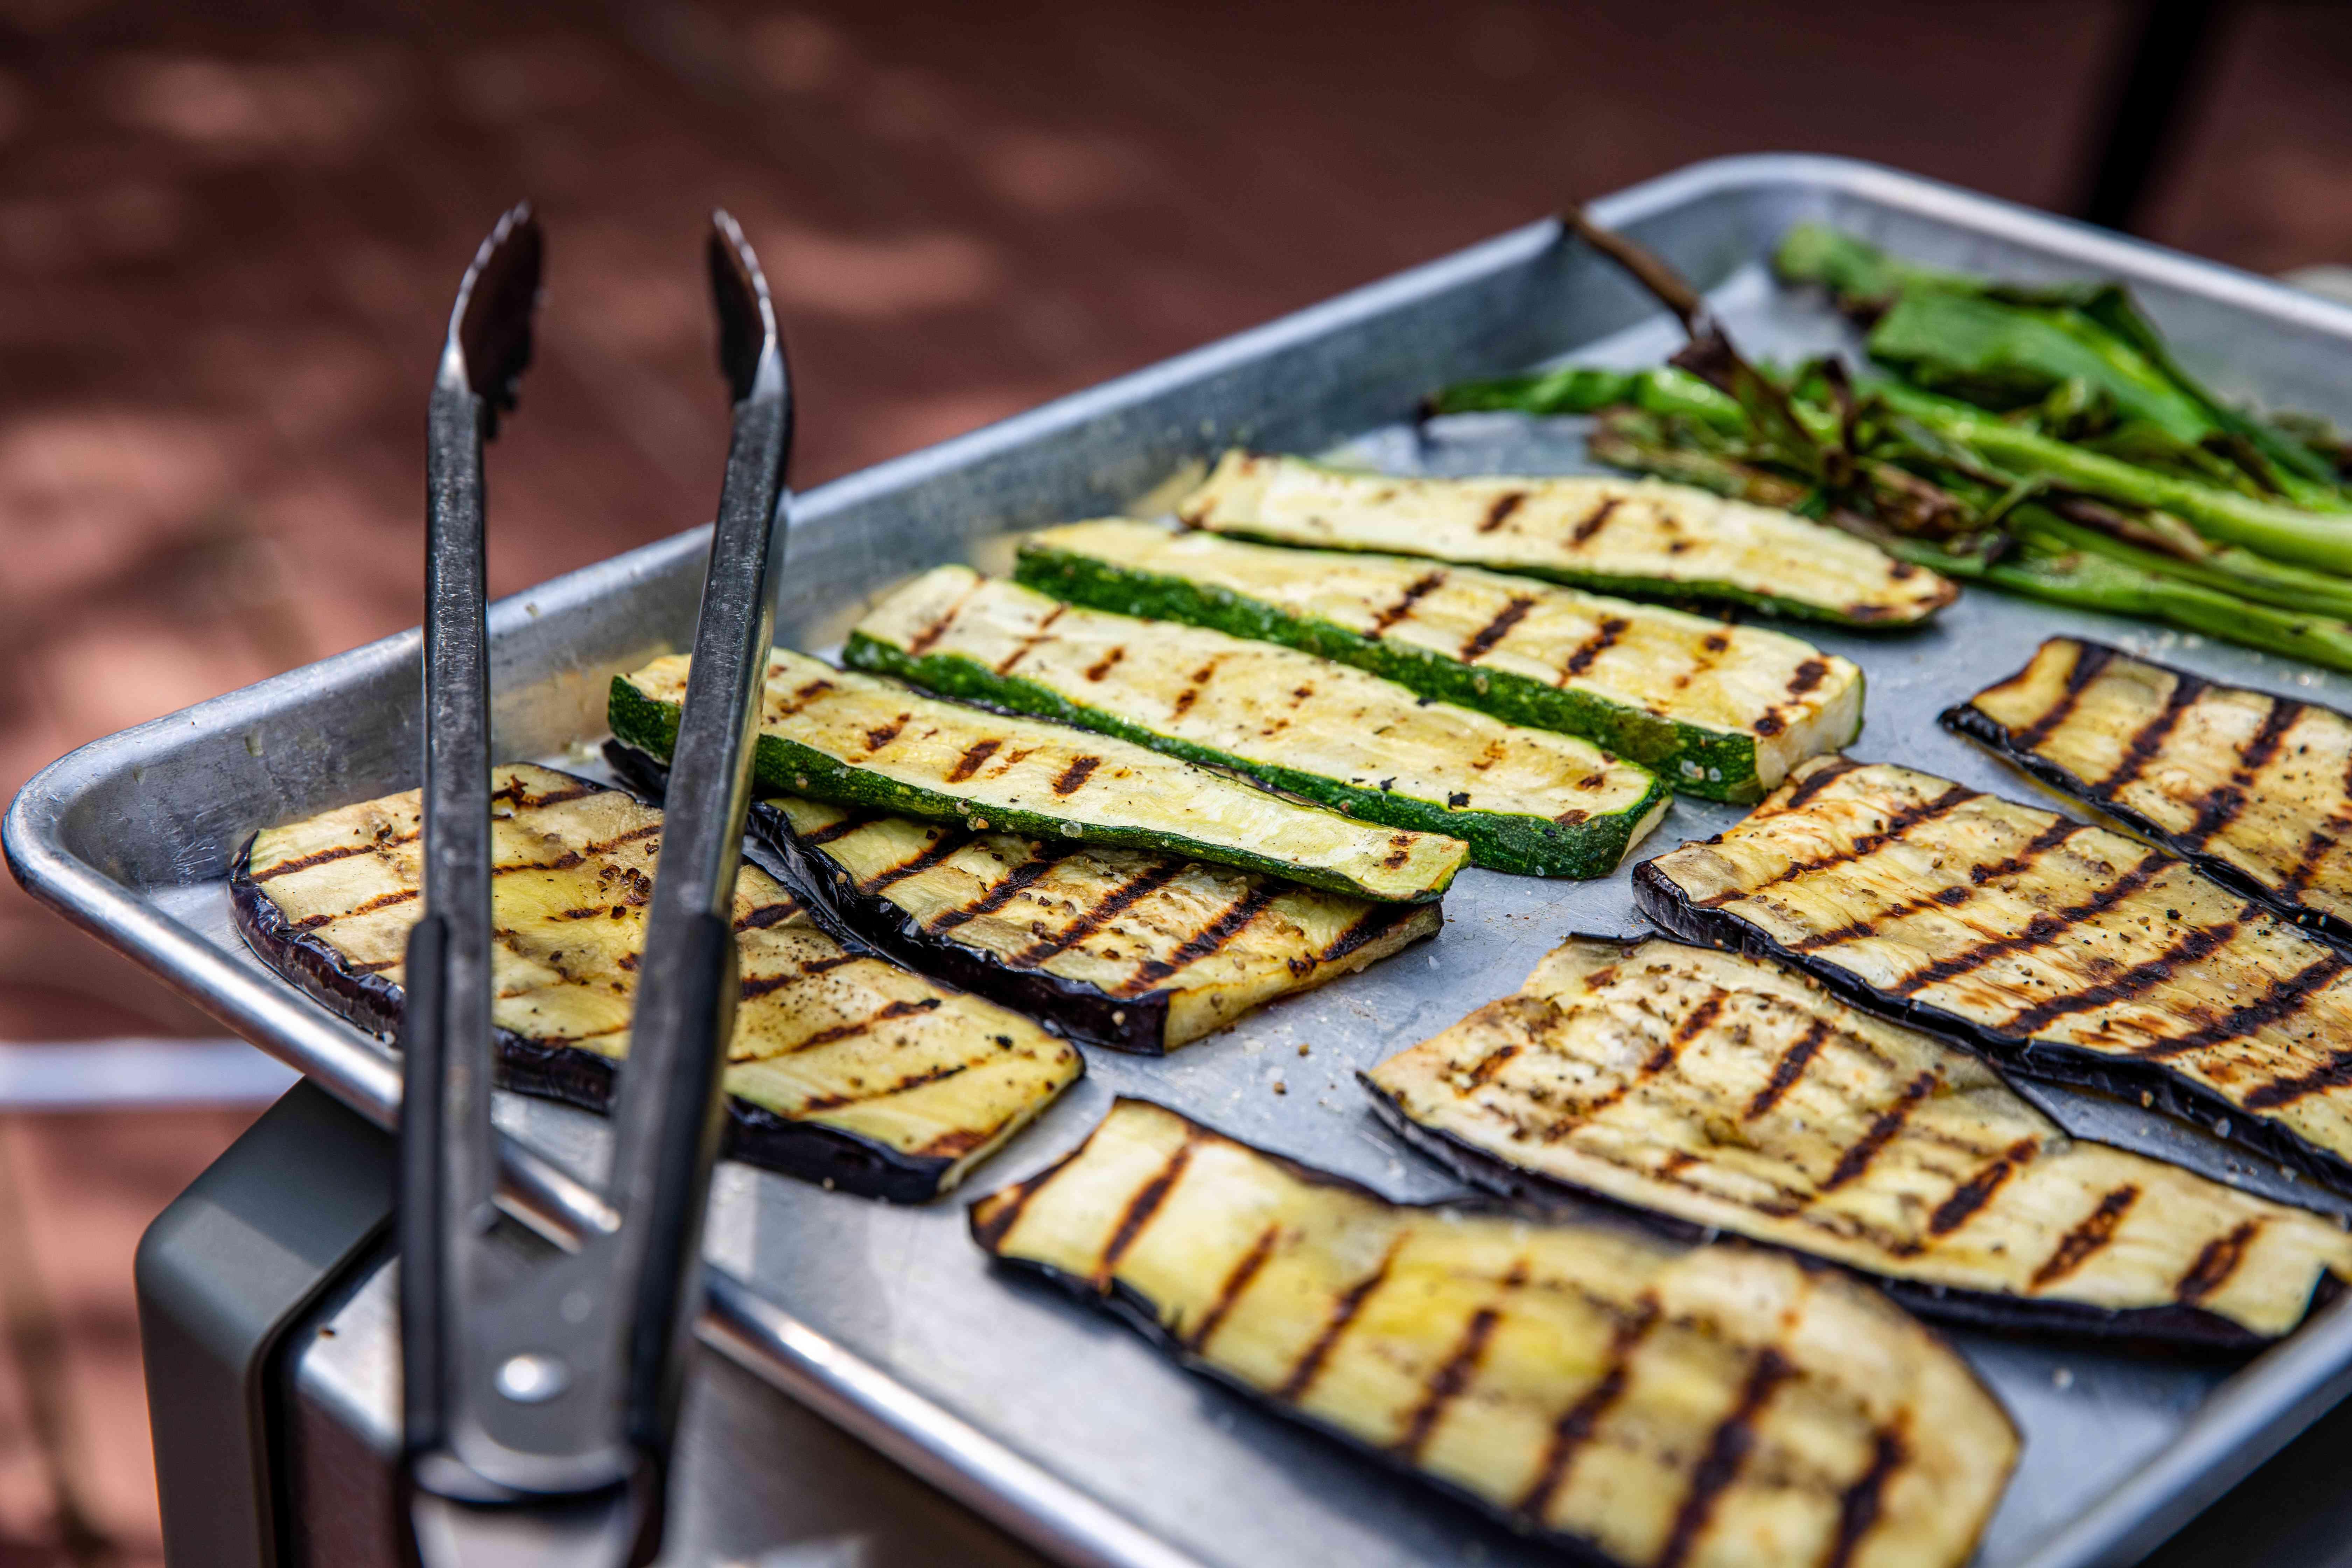 Grilled vegetables on a baking sheet to make easy grilled vegetable nachos.